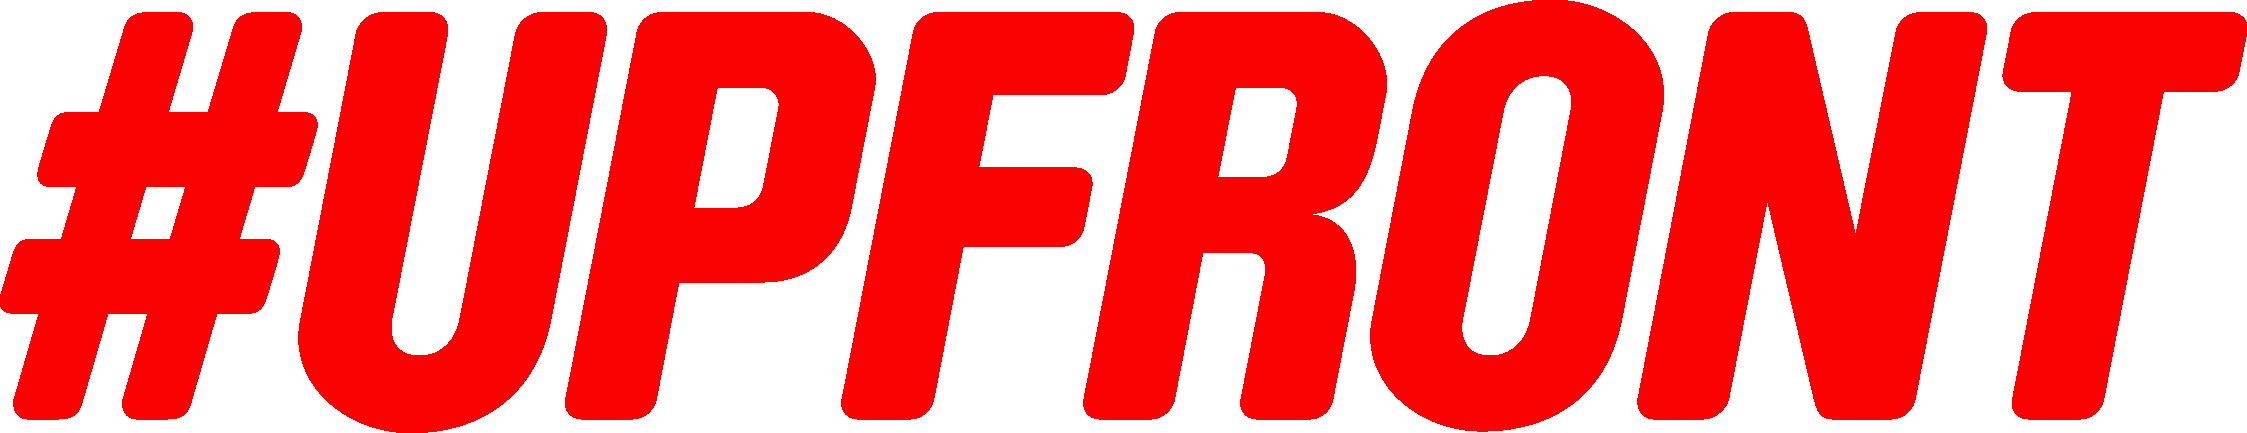 Upfront_Logo RED copy copy.png